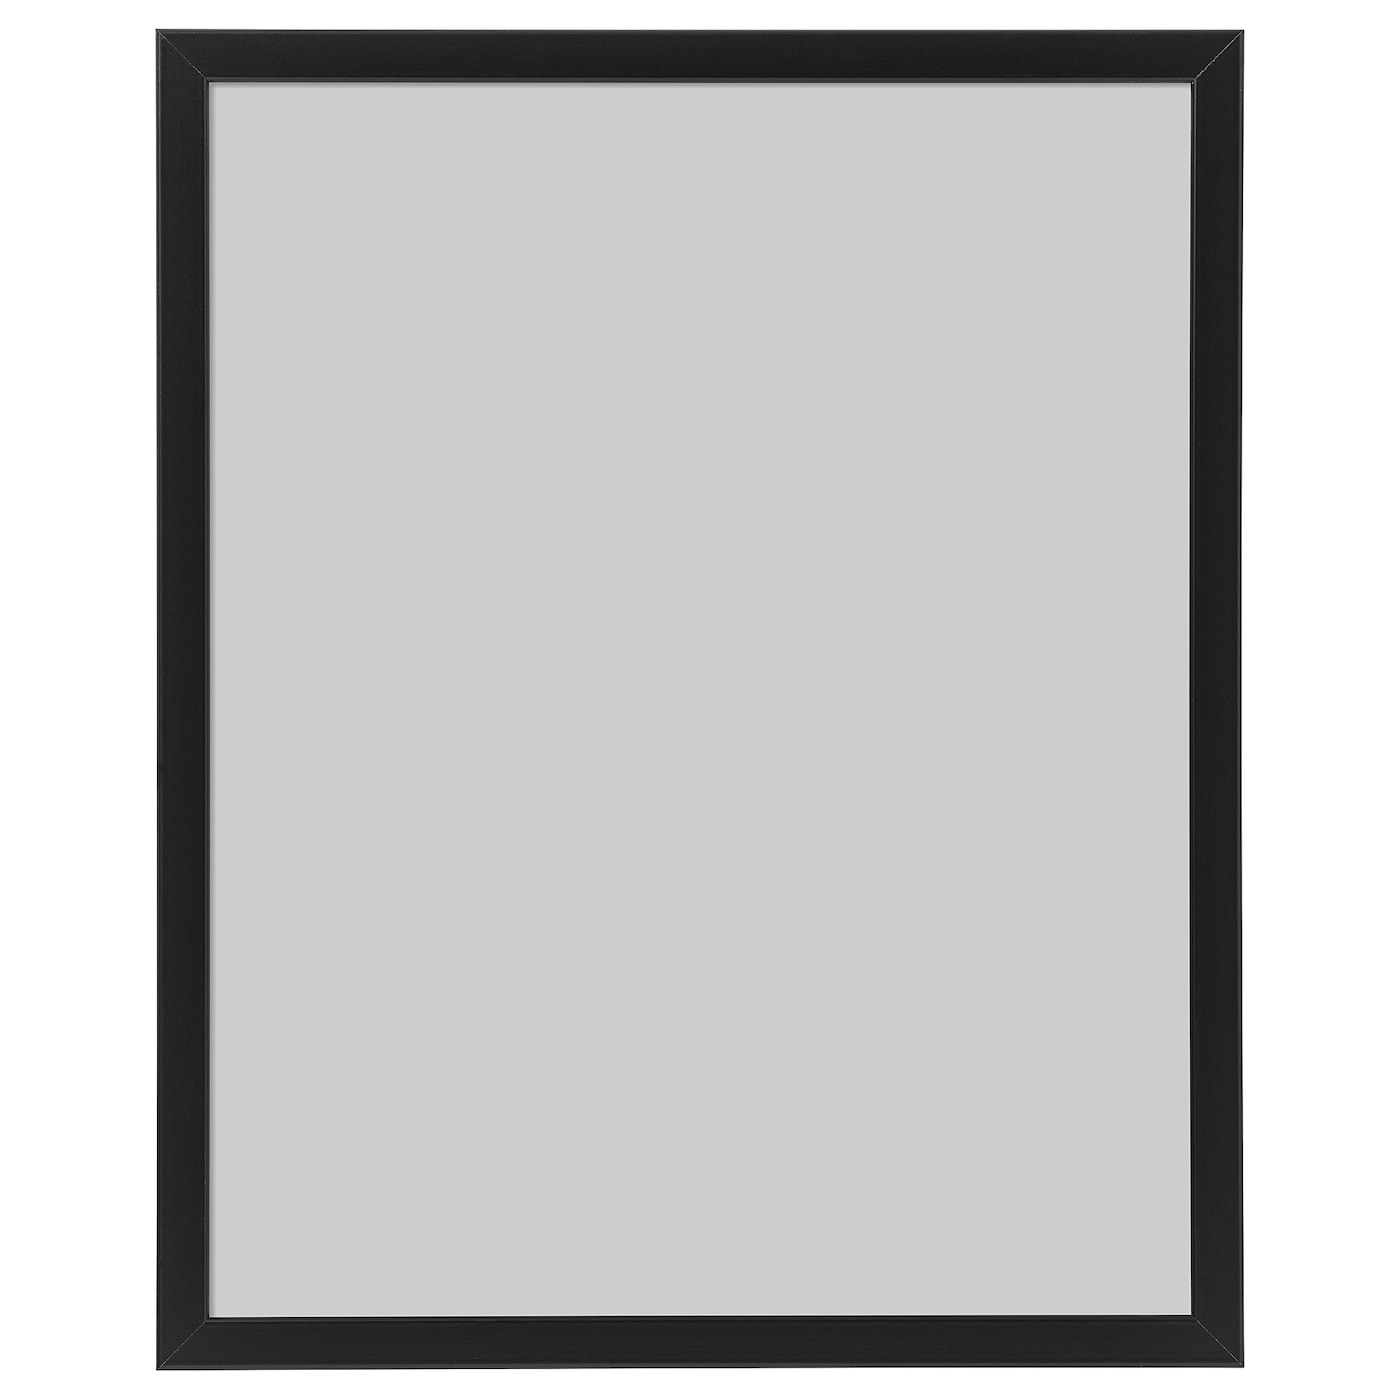 61 x 91,4 cm Basics Poster Photo Picture Frames 2-Pack Black